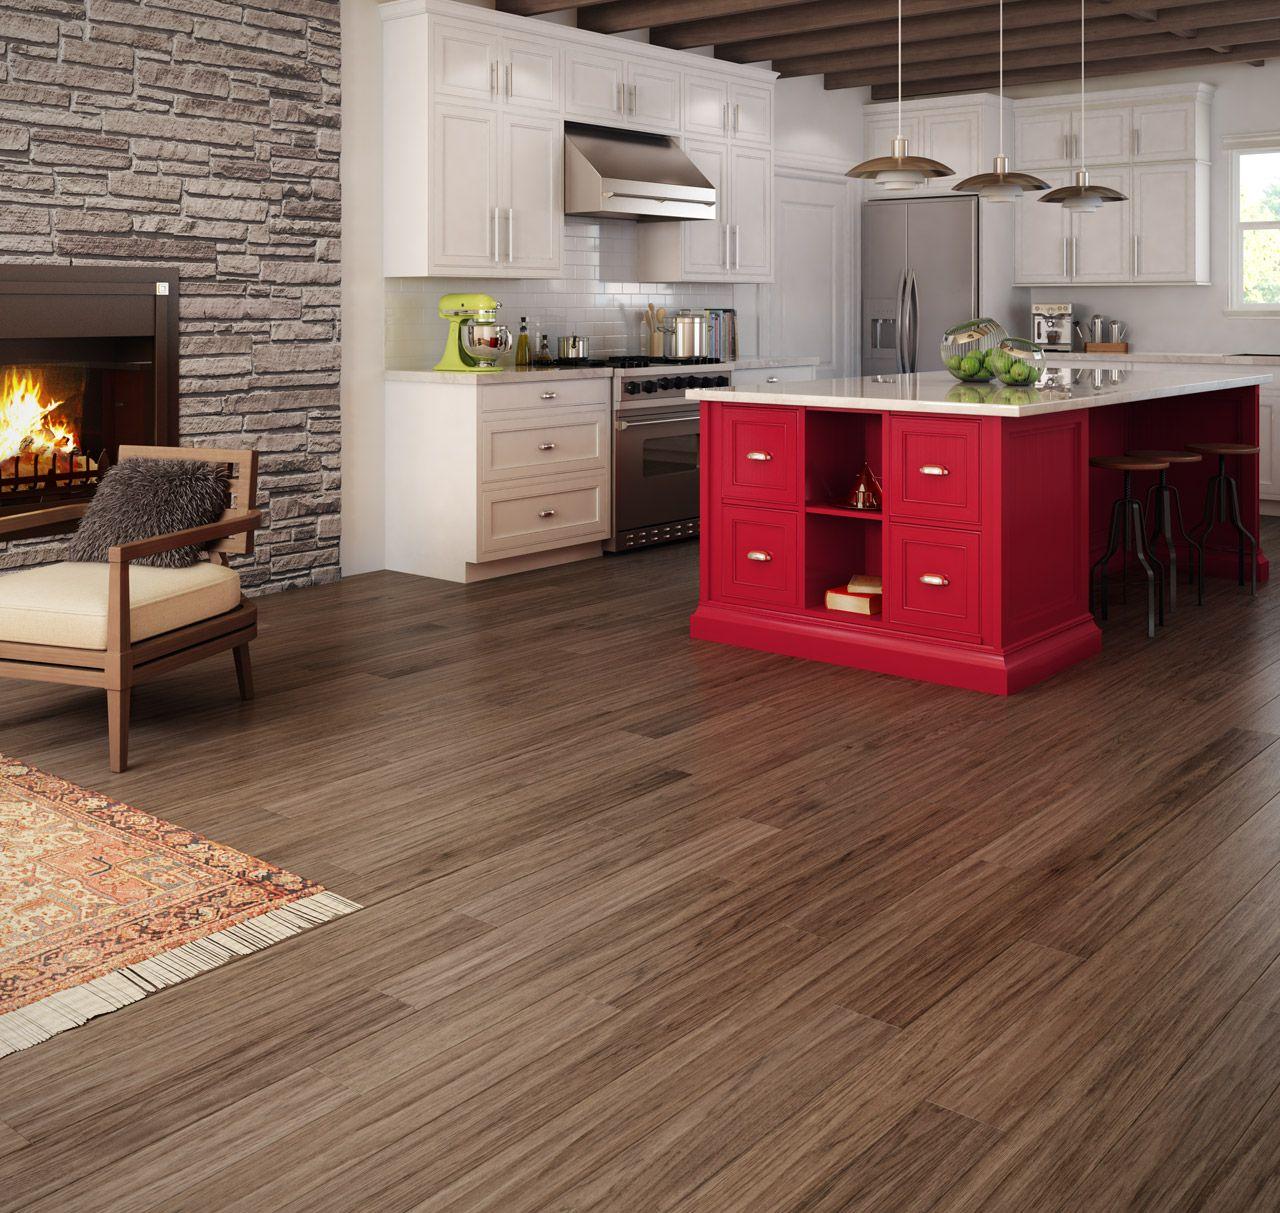 Engineered Hardwood Flooring In Kitchen Planchers De Bois Franc Preverco Cuisine Champ Tre Revisit E